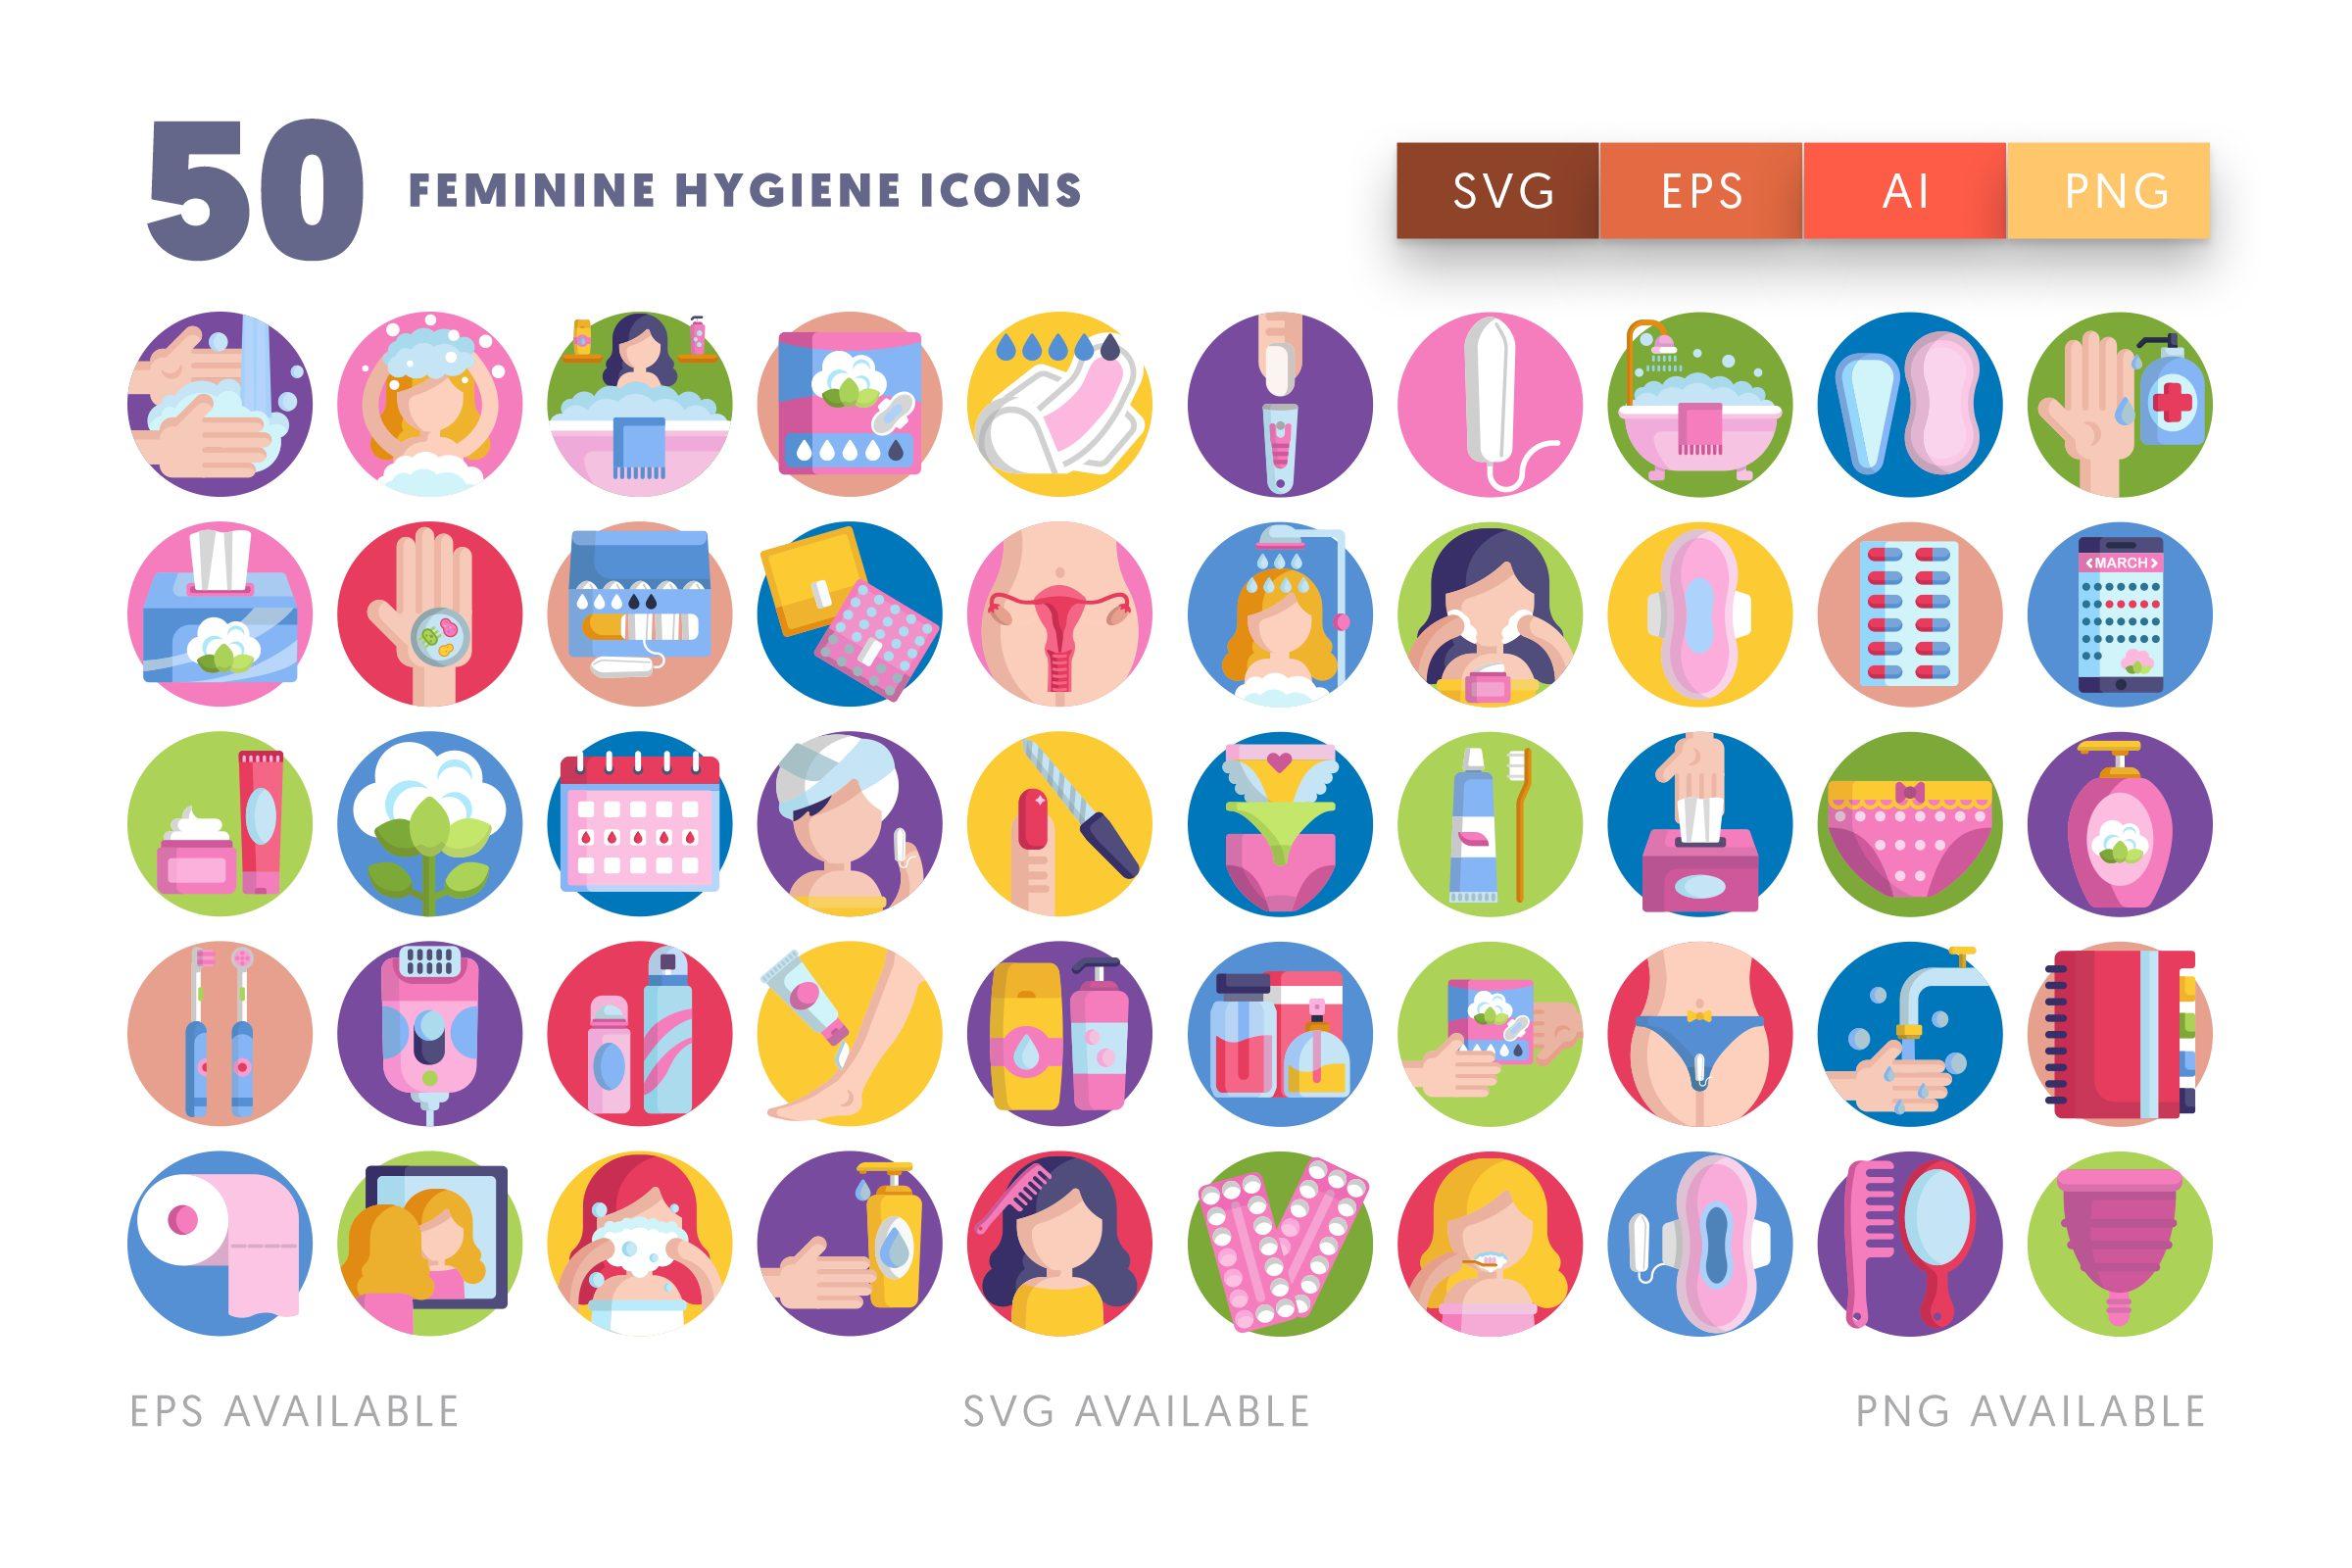 Feminine Hygiene icons png/svg/eps